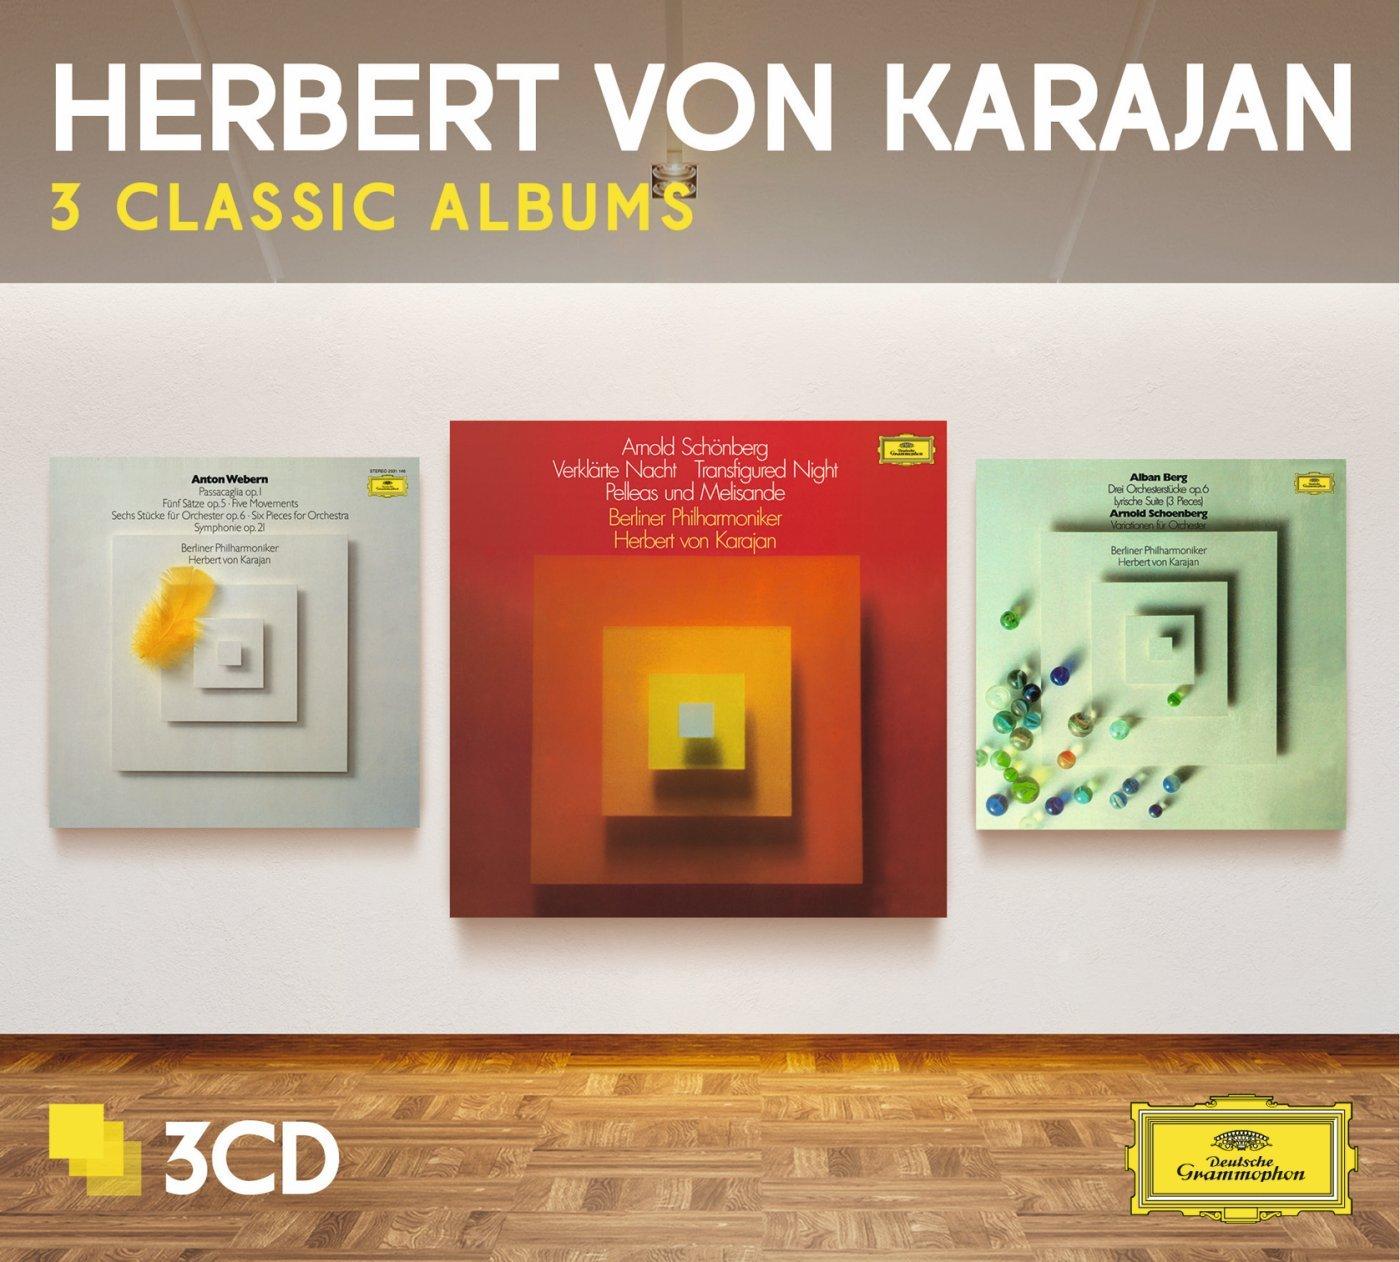 CD : Herbert von Karajan - Three Classic Albums (schoenberg/ Berg/ Webern) (Limited Edition, 3PC)